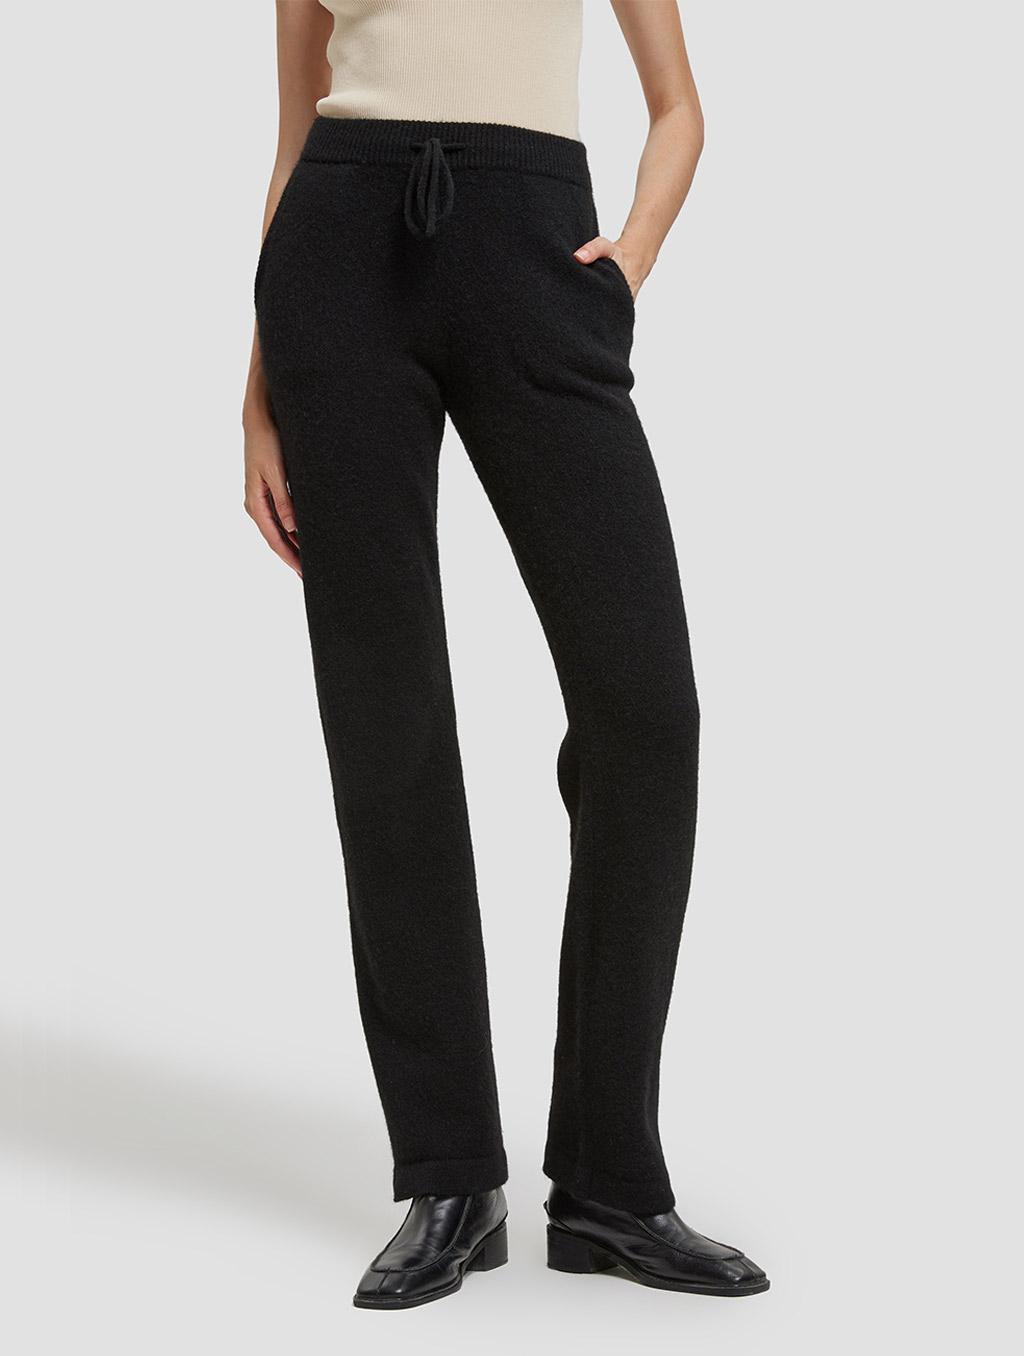 Drawstring straight yak wool pants-positive-black